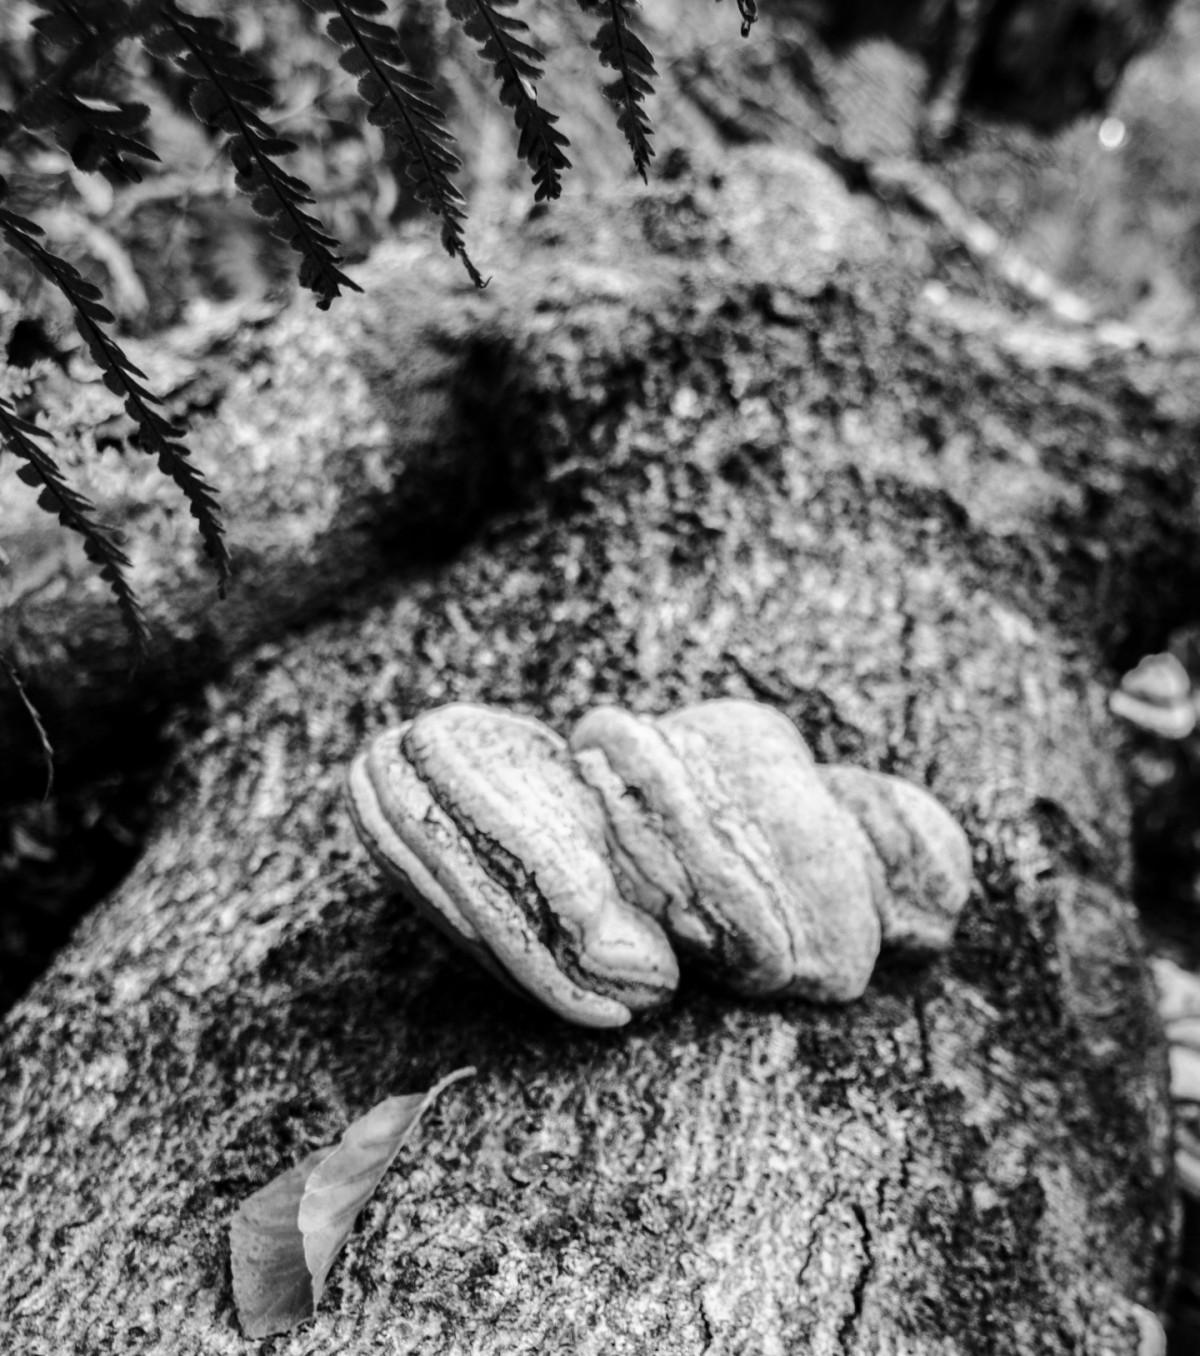 Polymore Mushrooms